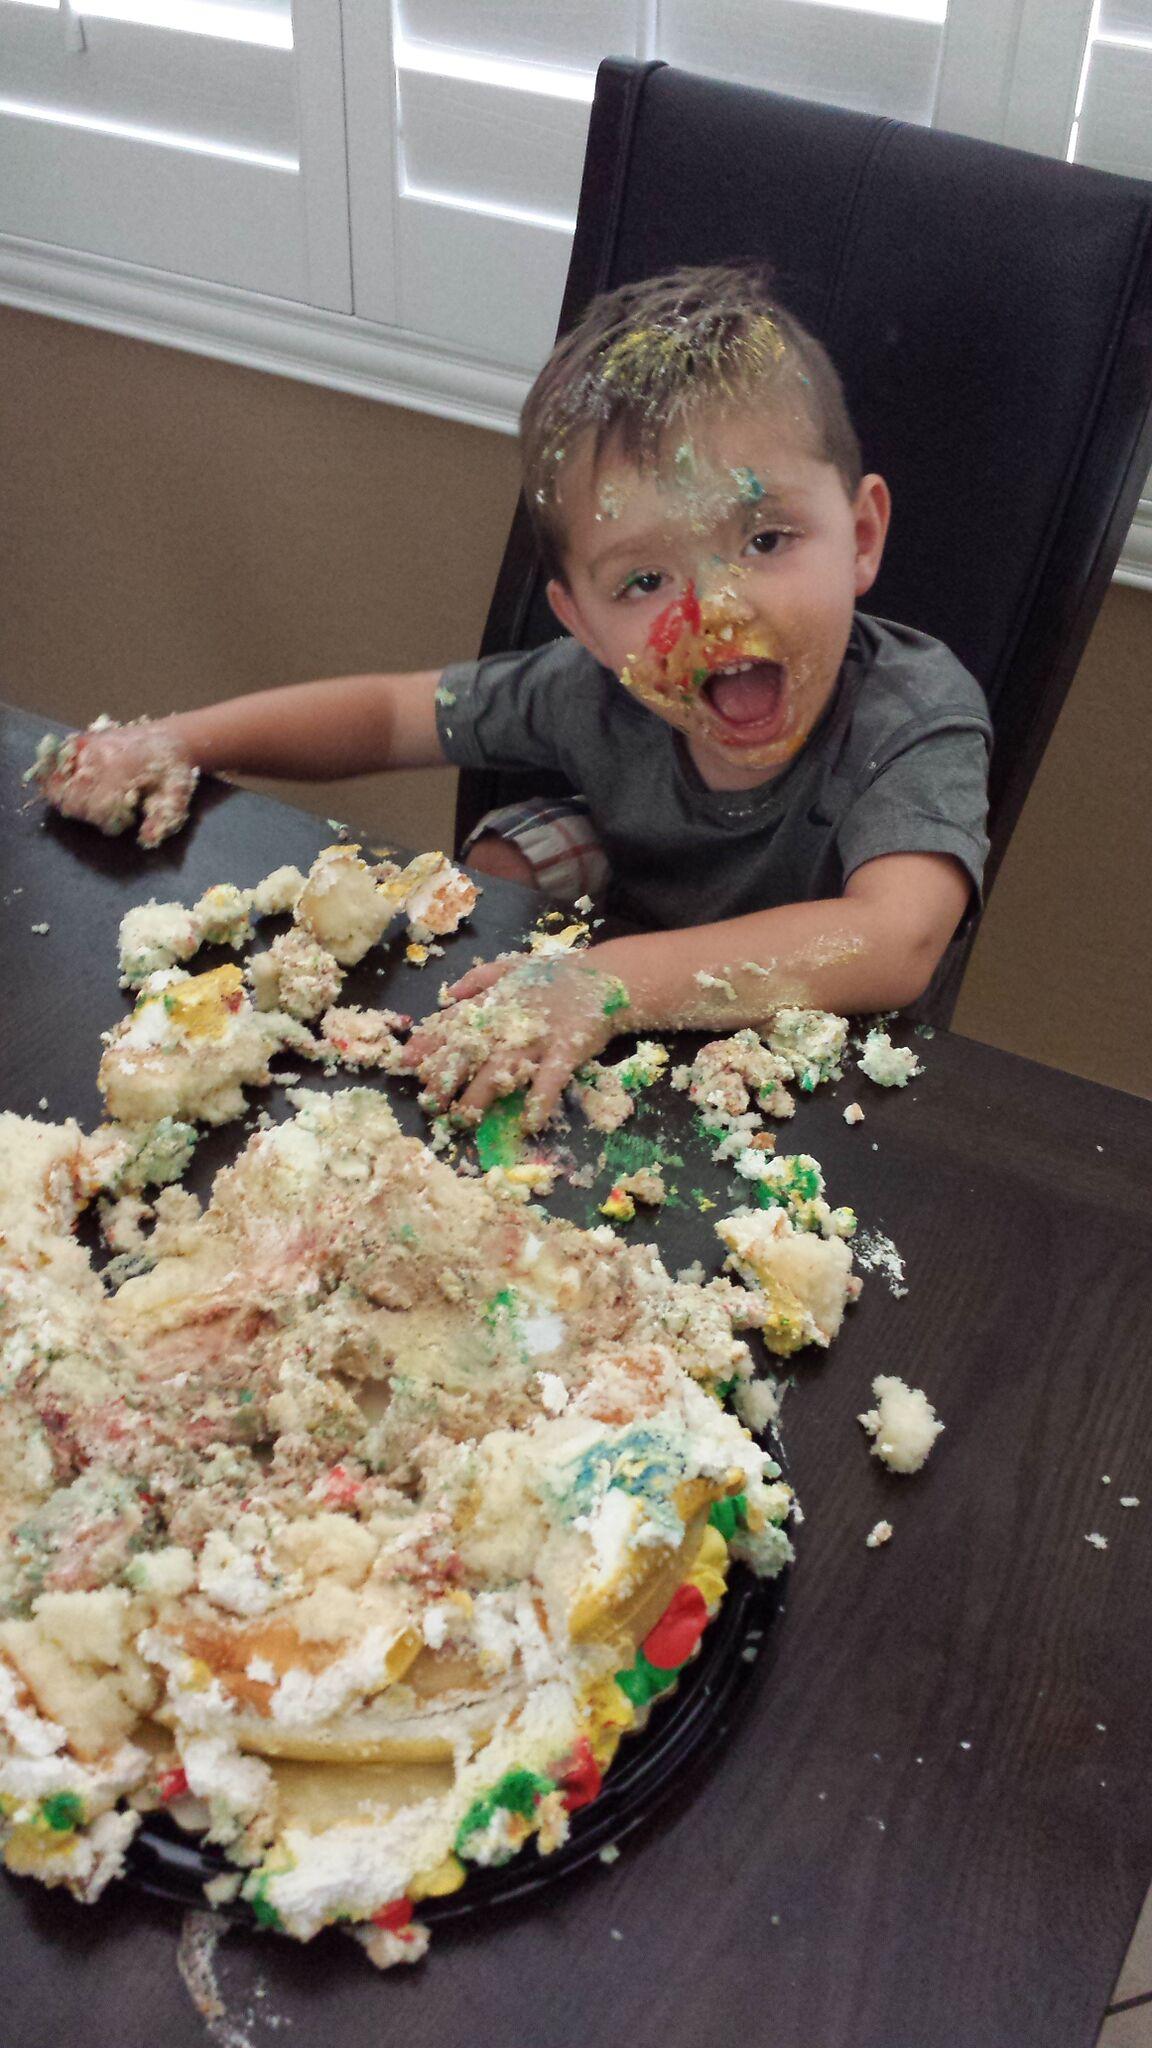 The cake smash.